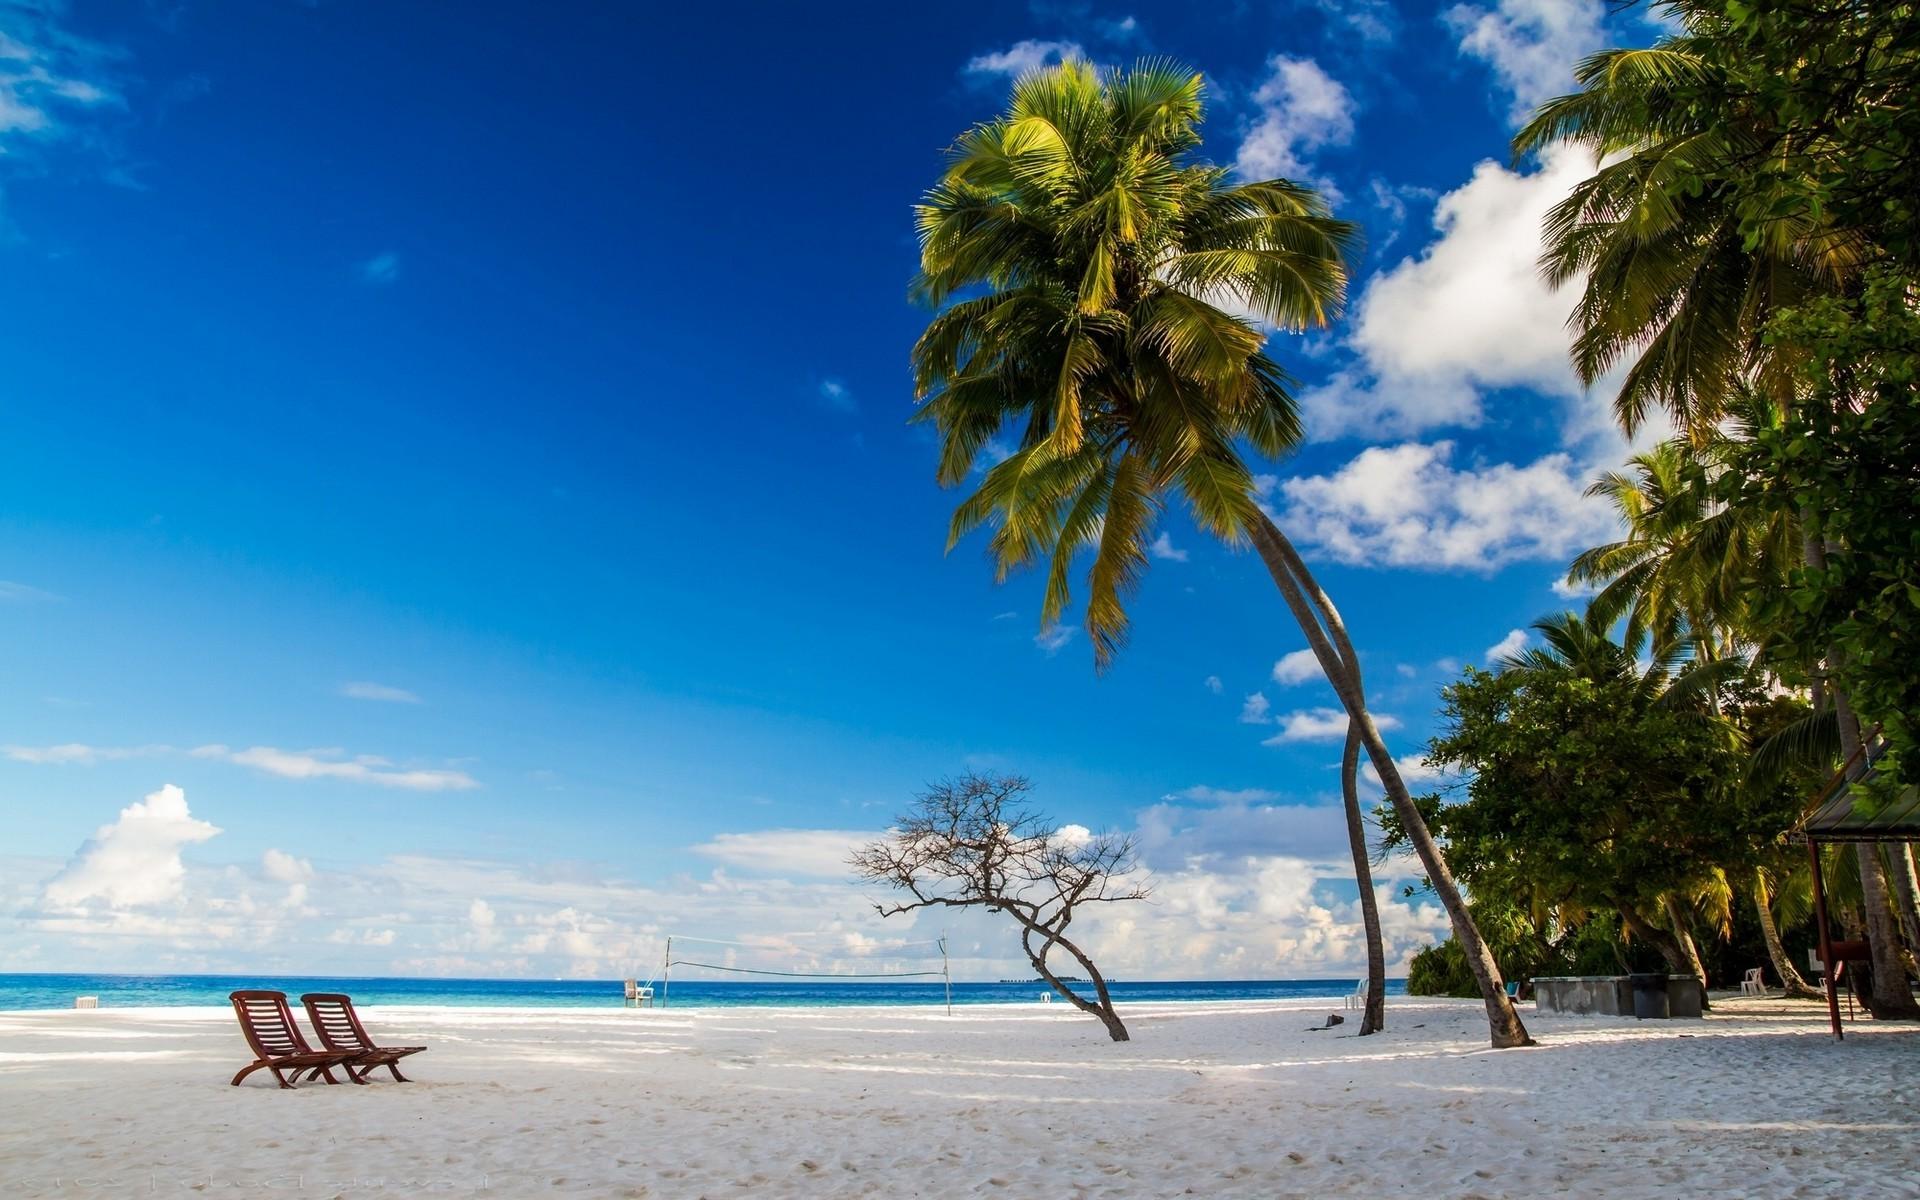 Wallpaper Sunlight Landscape White Sea Bay Nature Shore Sand Sky Beach Blue Chair Morning Coast Palm Trees Horizon Tropical Island